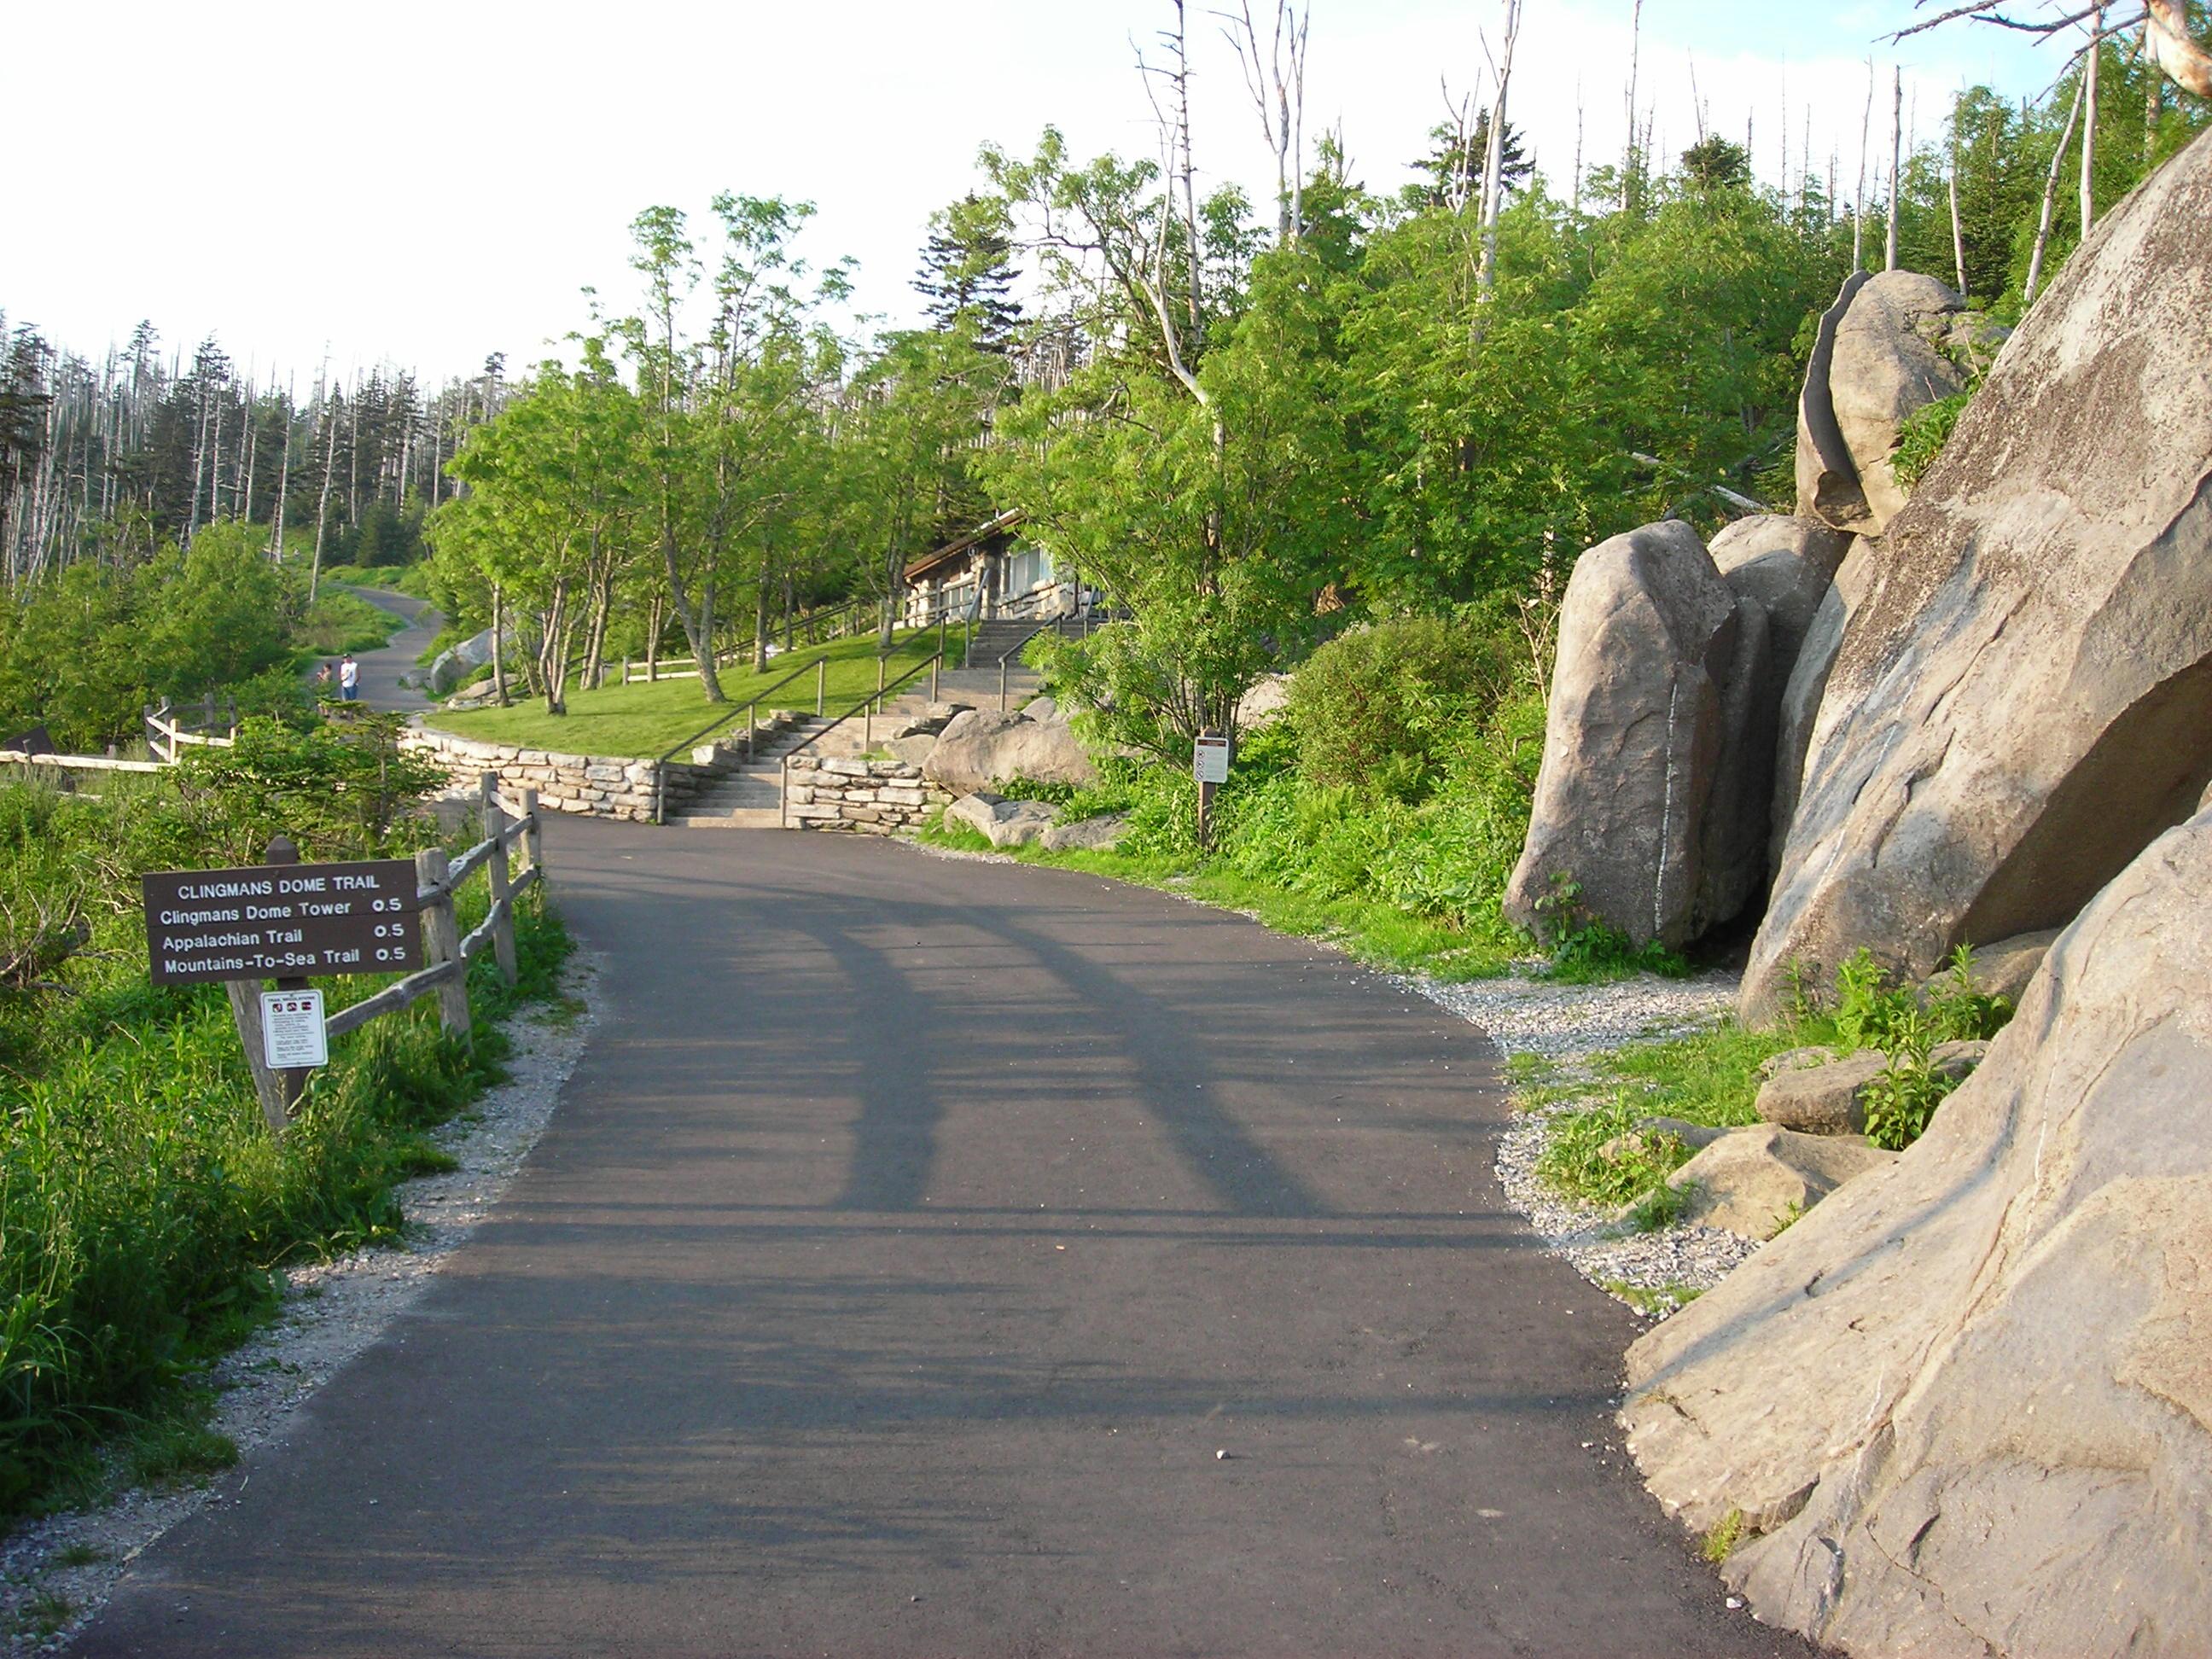 File:Trailhead of the Clingmans Dome Trail.JPG - Wikimedia ...